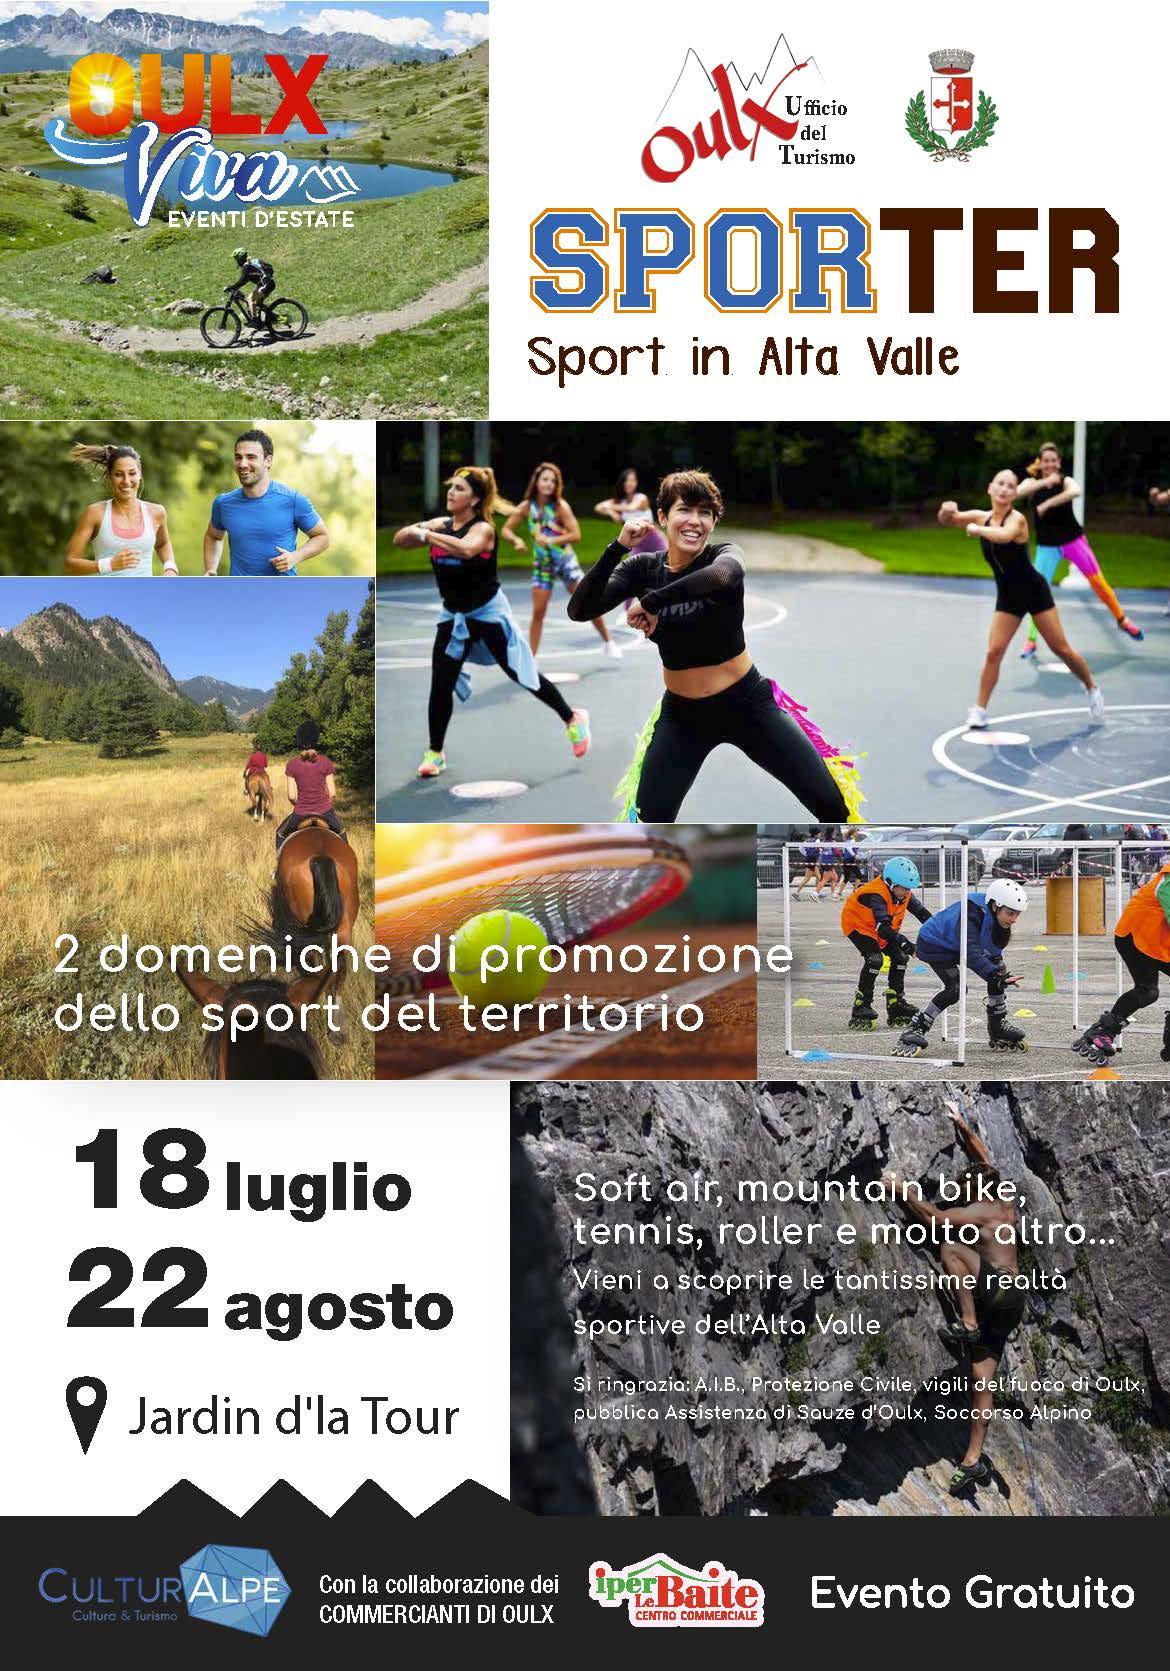 SPORTER, Sport in Alta Valle